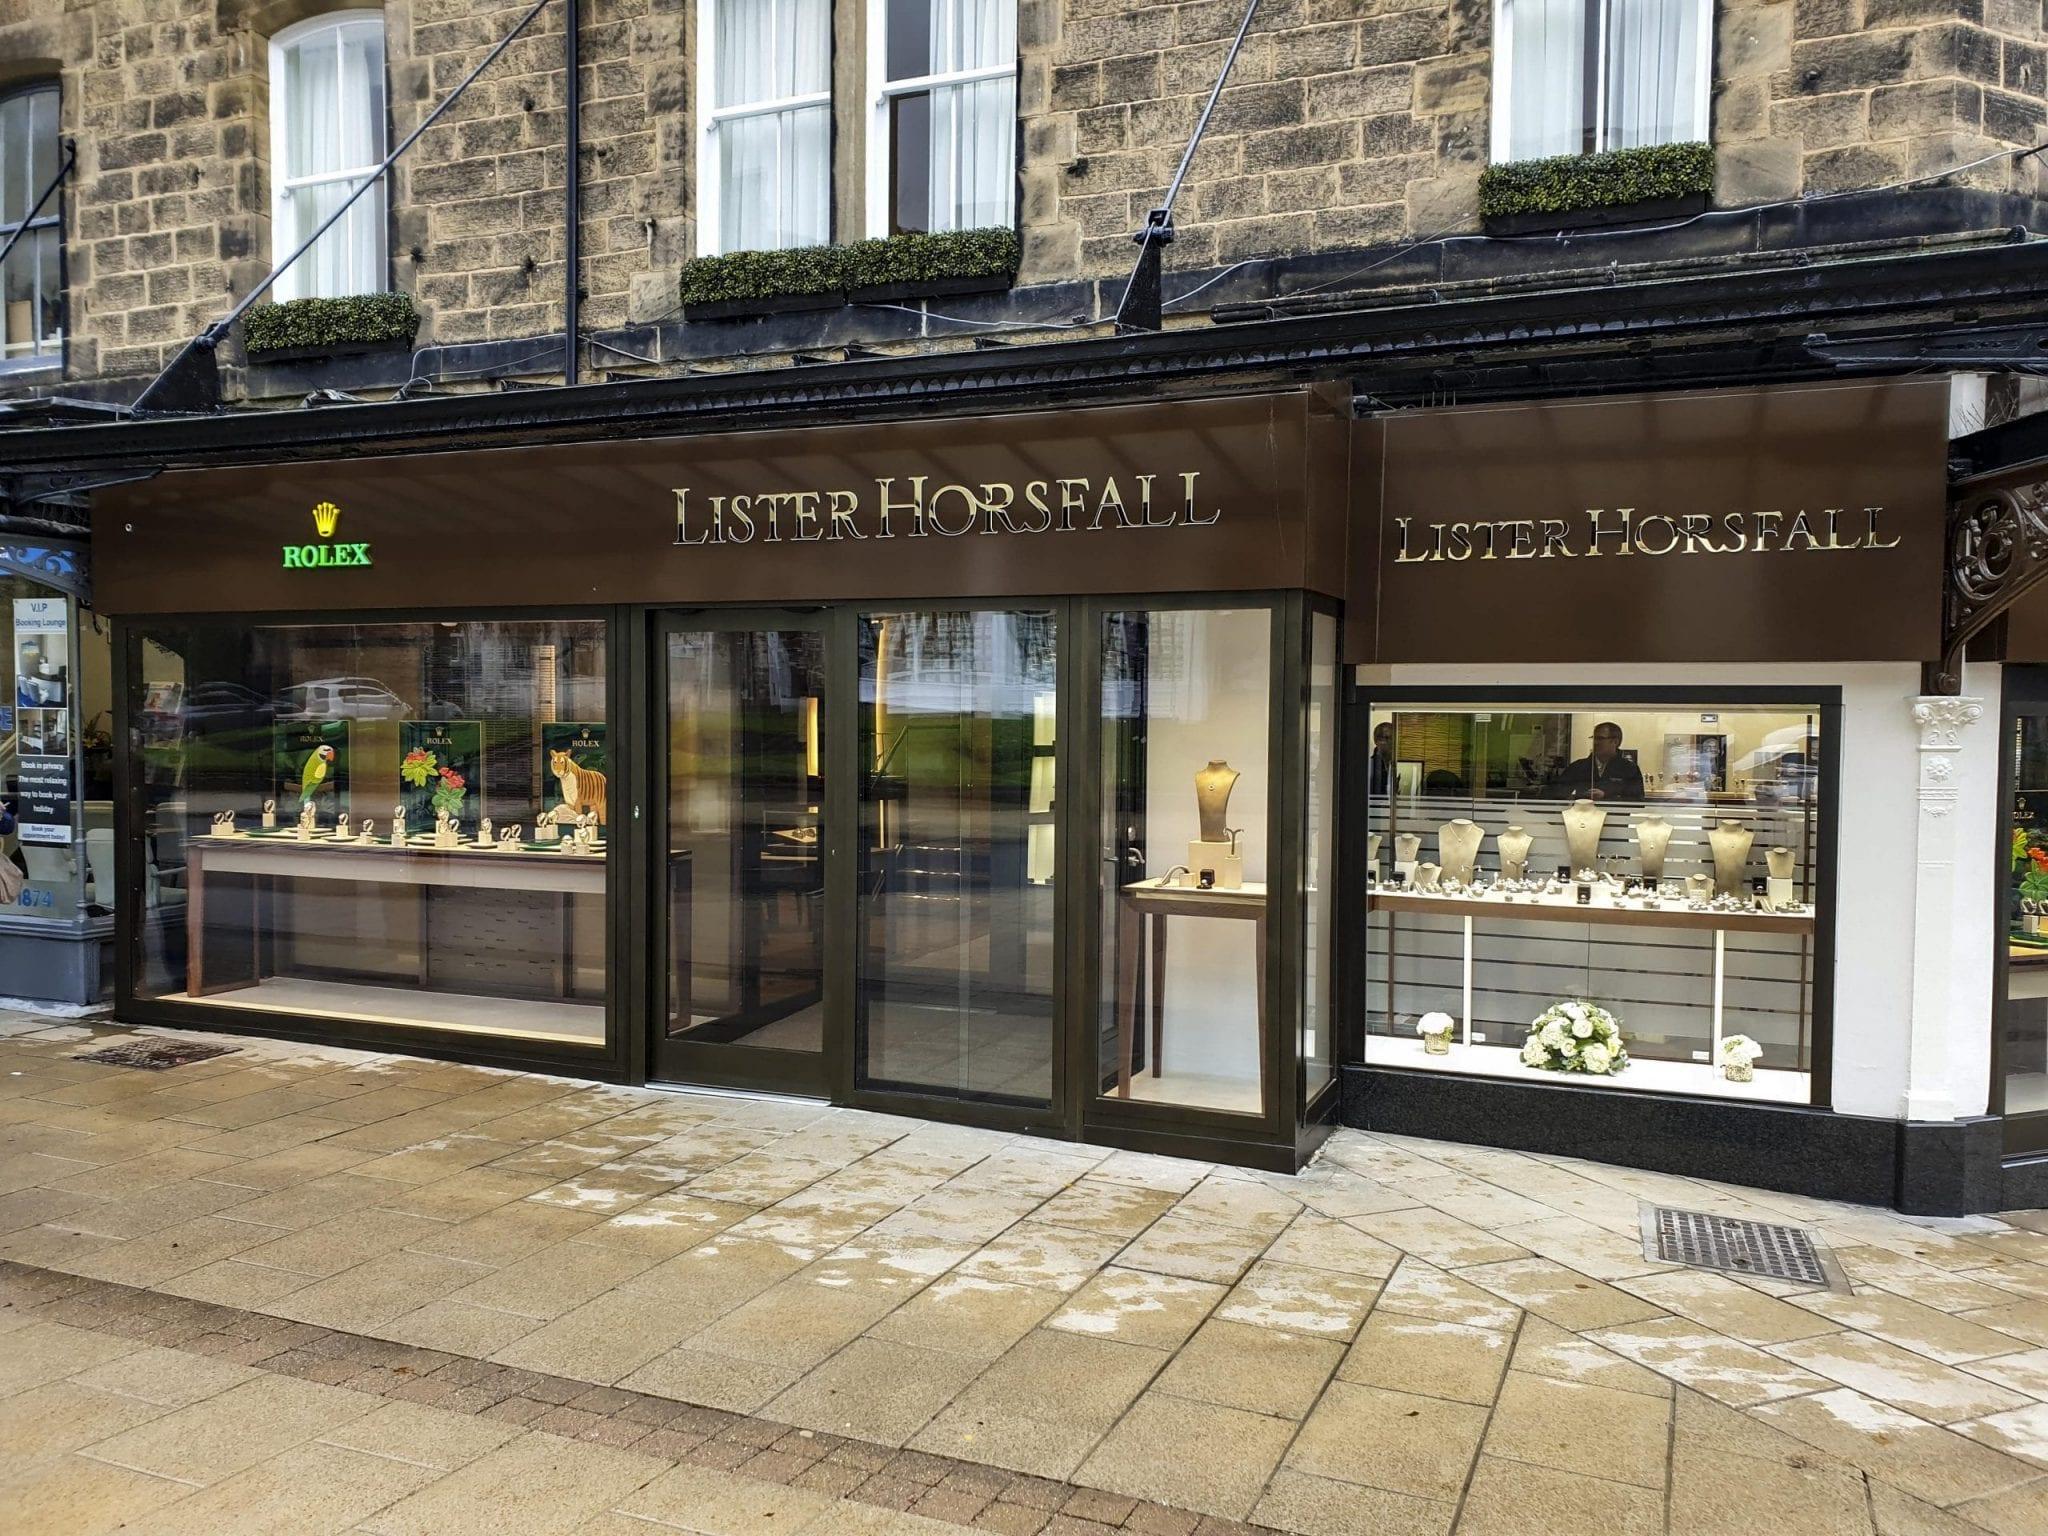 Lister Horsfall's Warrior Shop Front & Fully Glazed Interlocking Sliding Doors